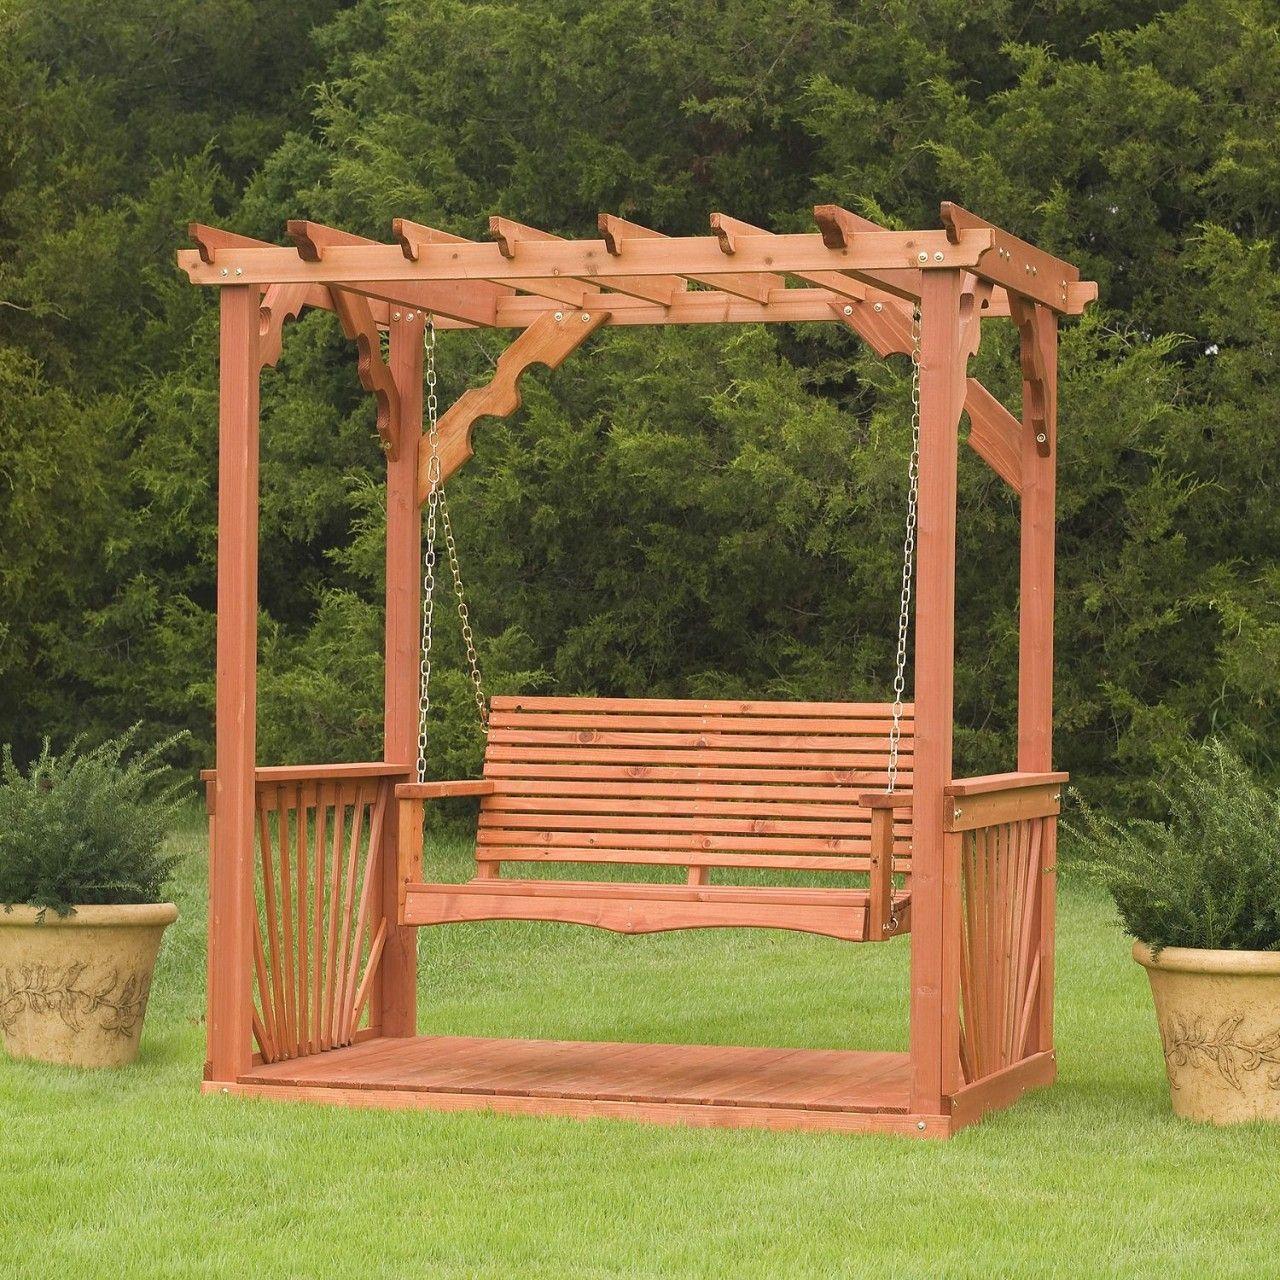 Porch Swing Frame Plan Wooden Cedar Wood Pergola Yard Garden Free Standing